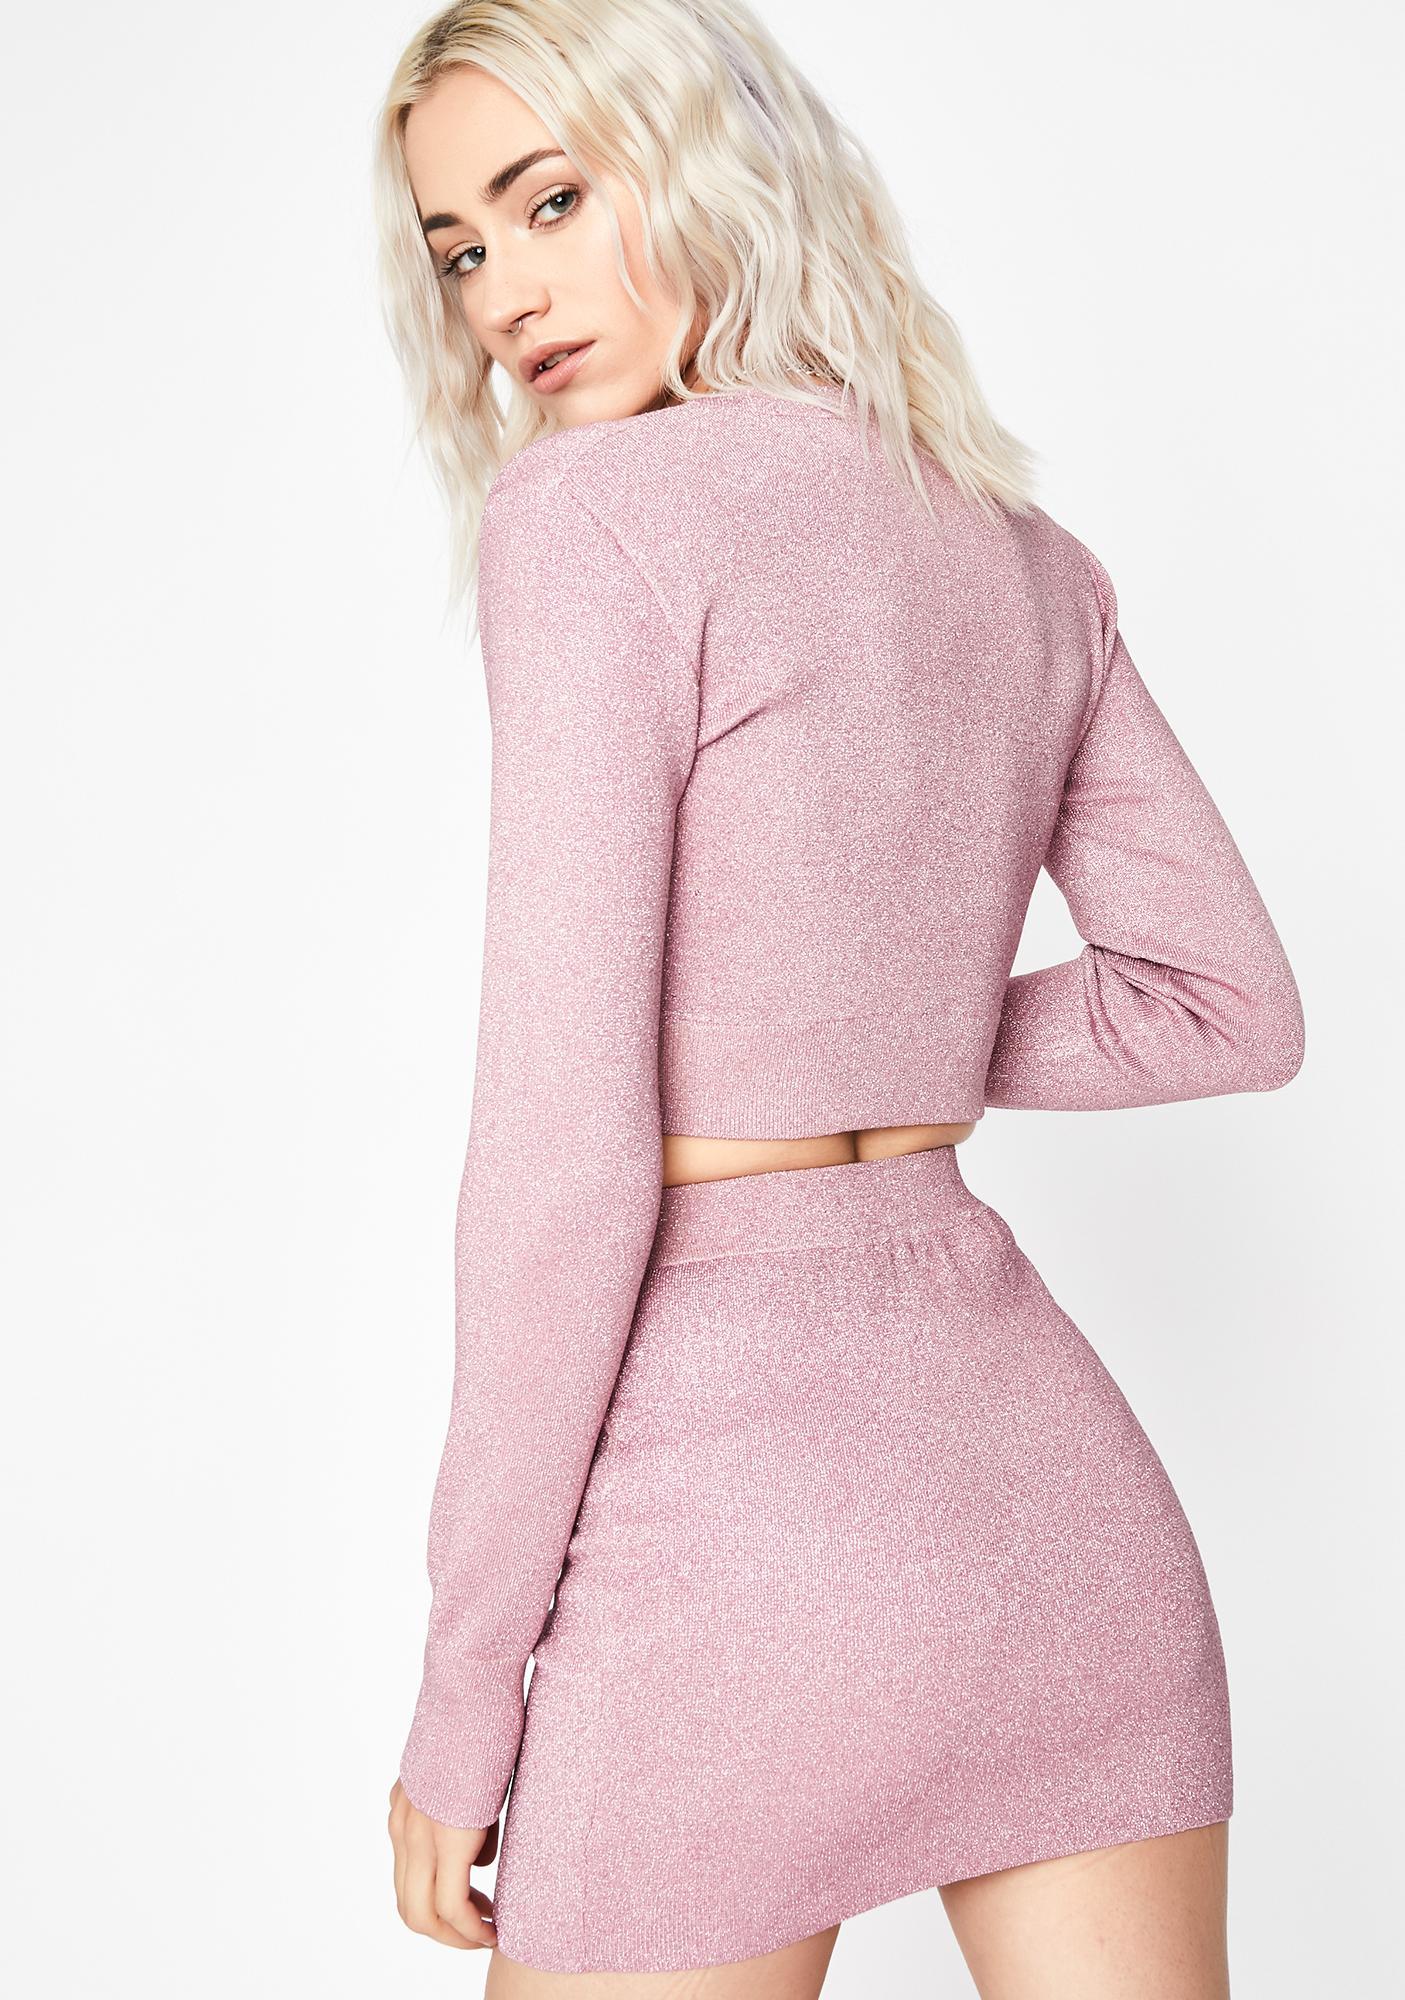 Baby Droppin' Digits Skirt Set